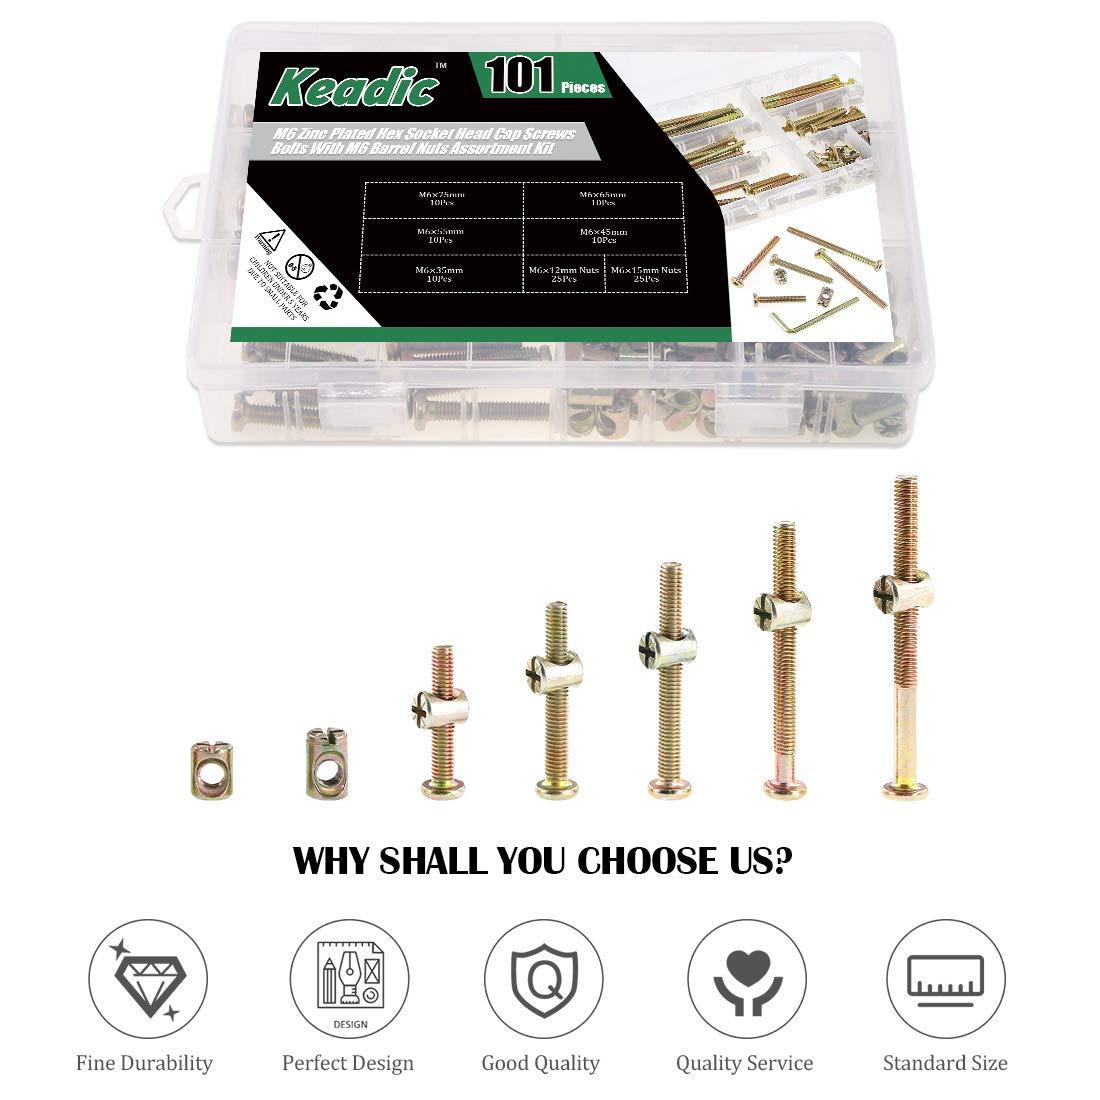 35//45//55//65//75mm Zinc Plated Steel Barrel Bolt Nuts Hardware Replacement Kit for Furniture Cots Beds Crib 1 Hex Key for Free Keadic 100Pcs M6 Hex Socket Head Cap Screws Nuts